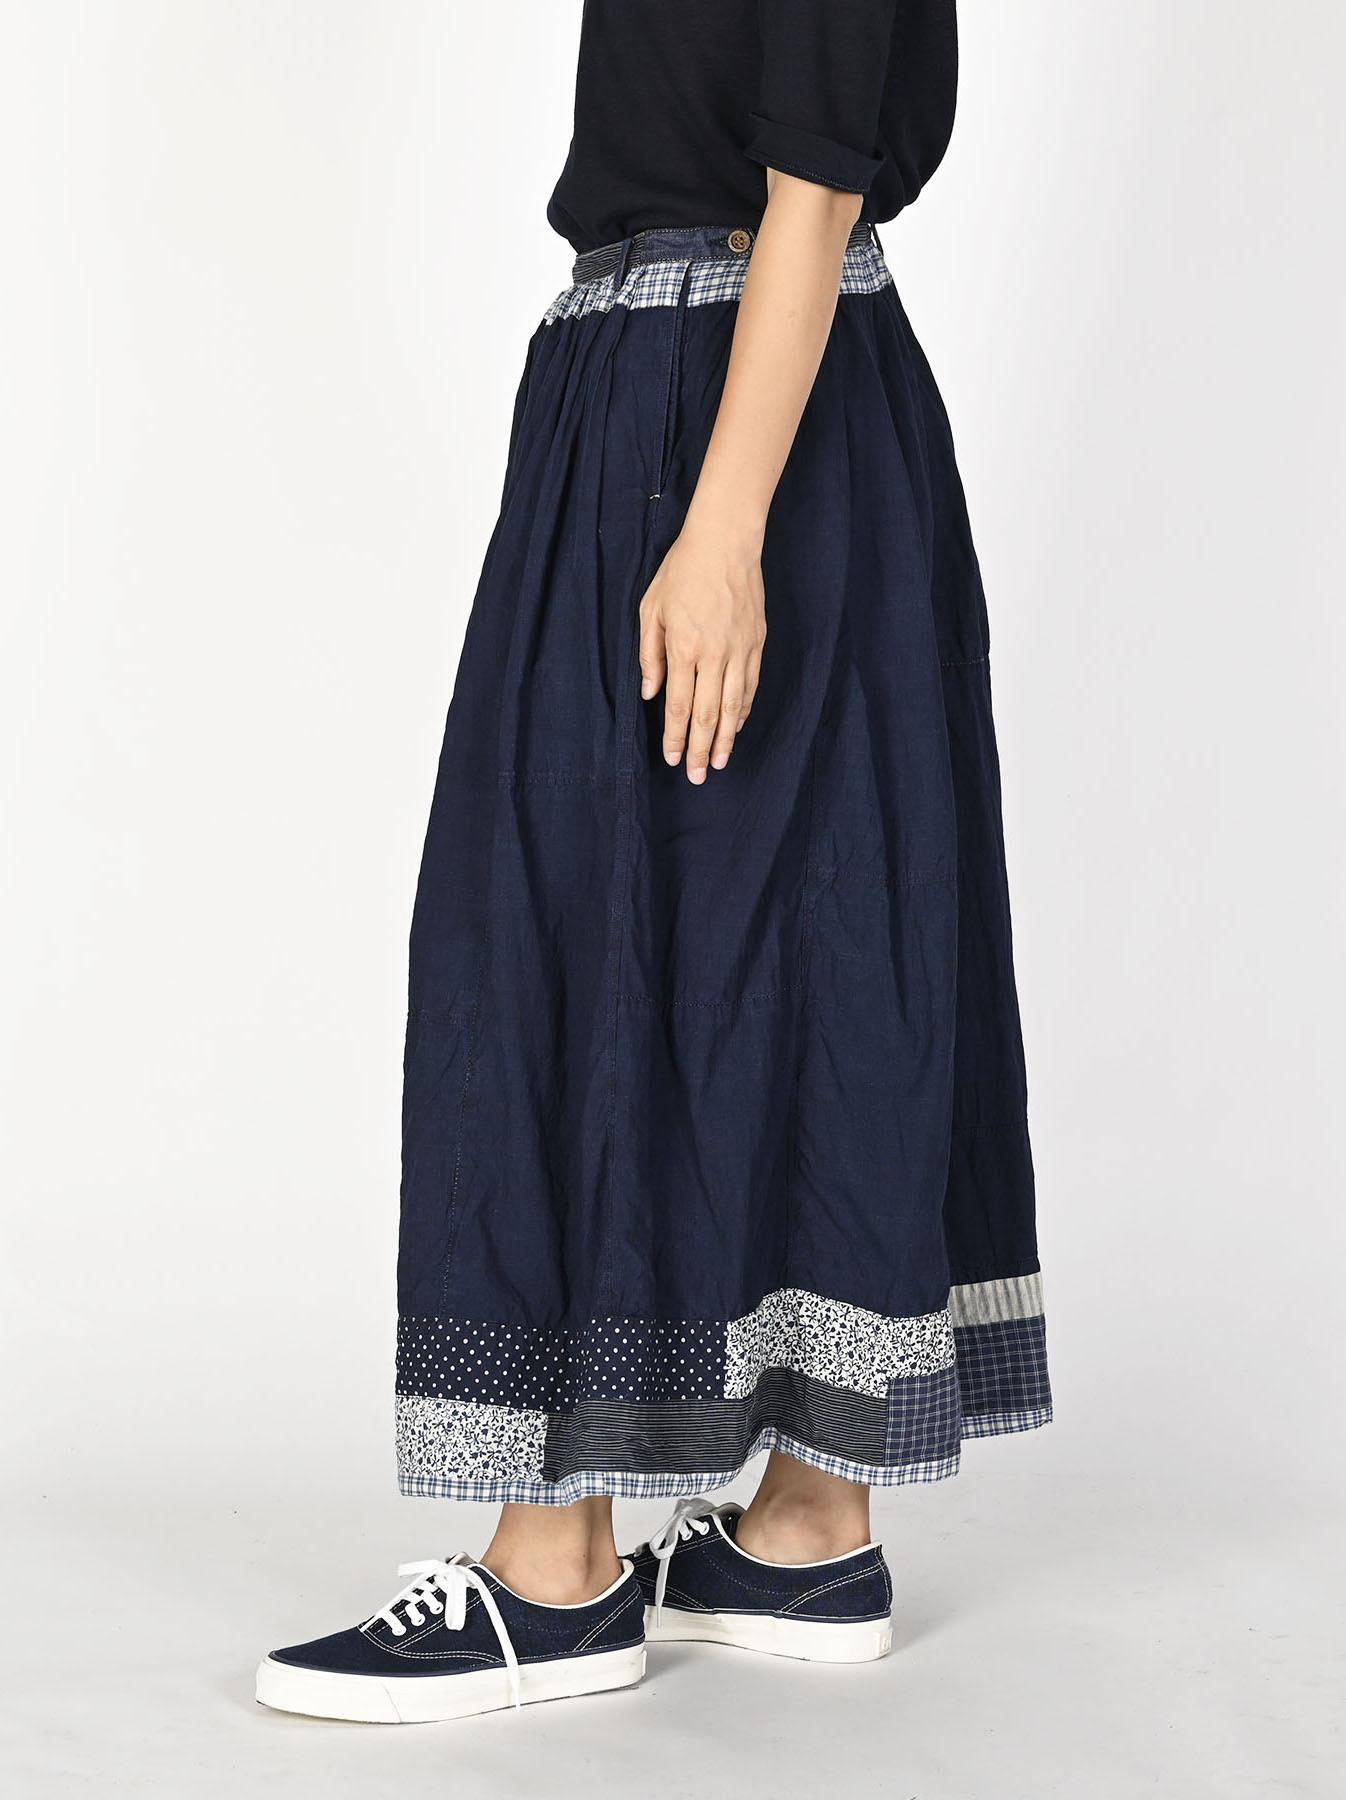 Indigo Tappet Patchwork Skirt-4